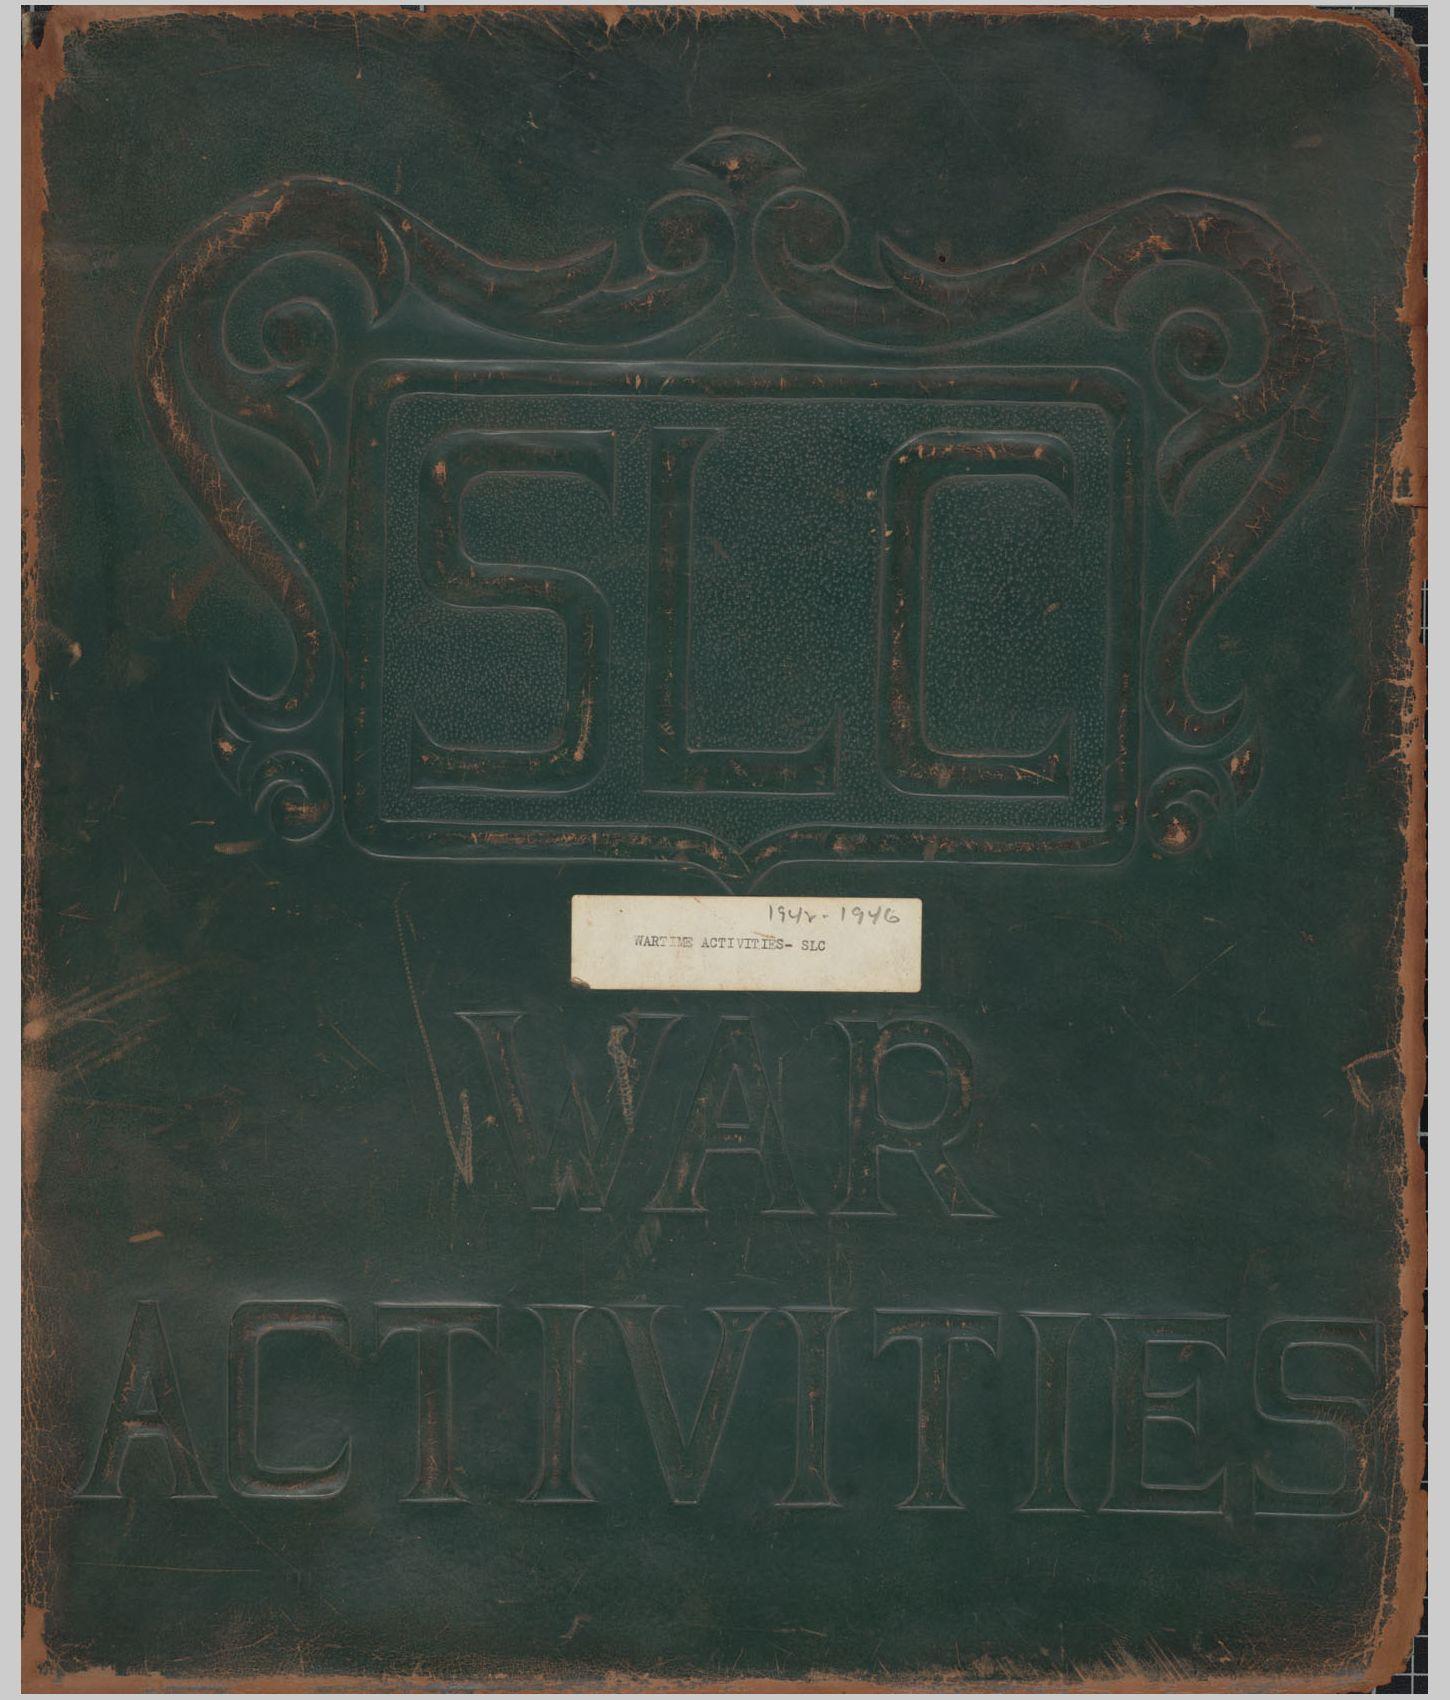 Student War Board Scrapbook, 1942-1946